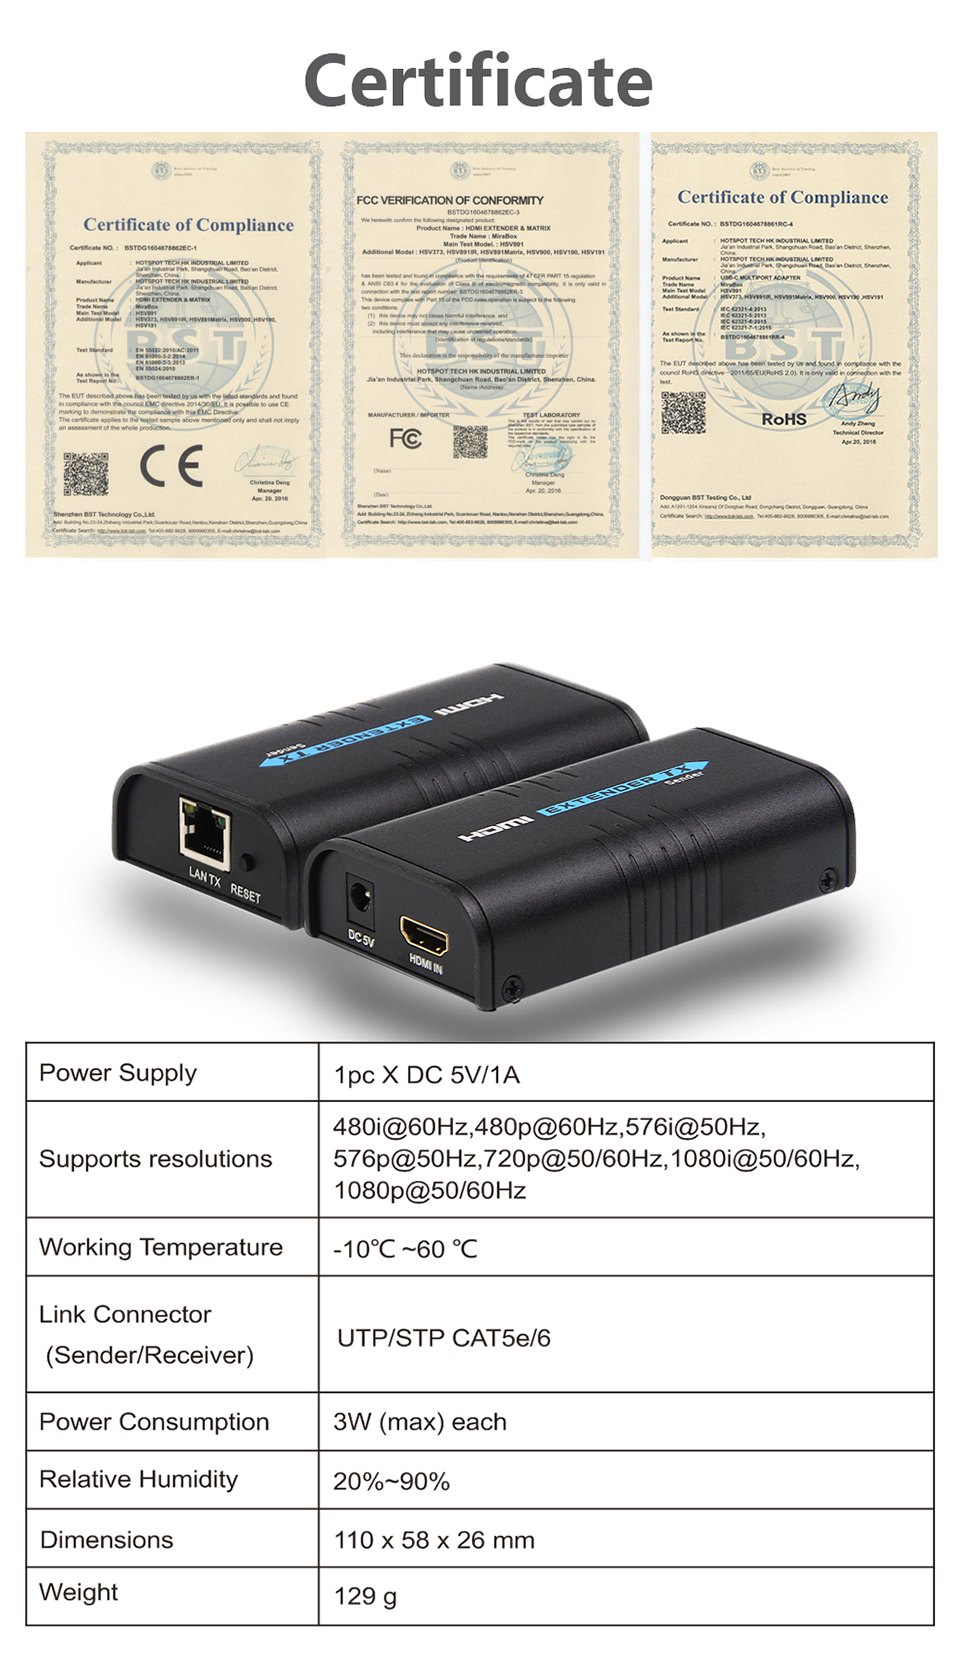 MiraBox HDMI Extender Over Splitter IPTCP UTPSTP CAT5e6 Rj45 LAN Network Support 1080p 120m HDMI Transmitter and Receiver (8)